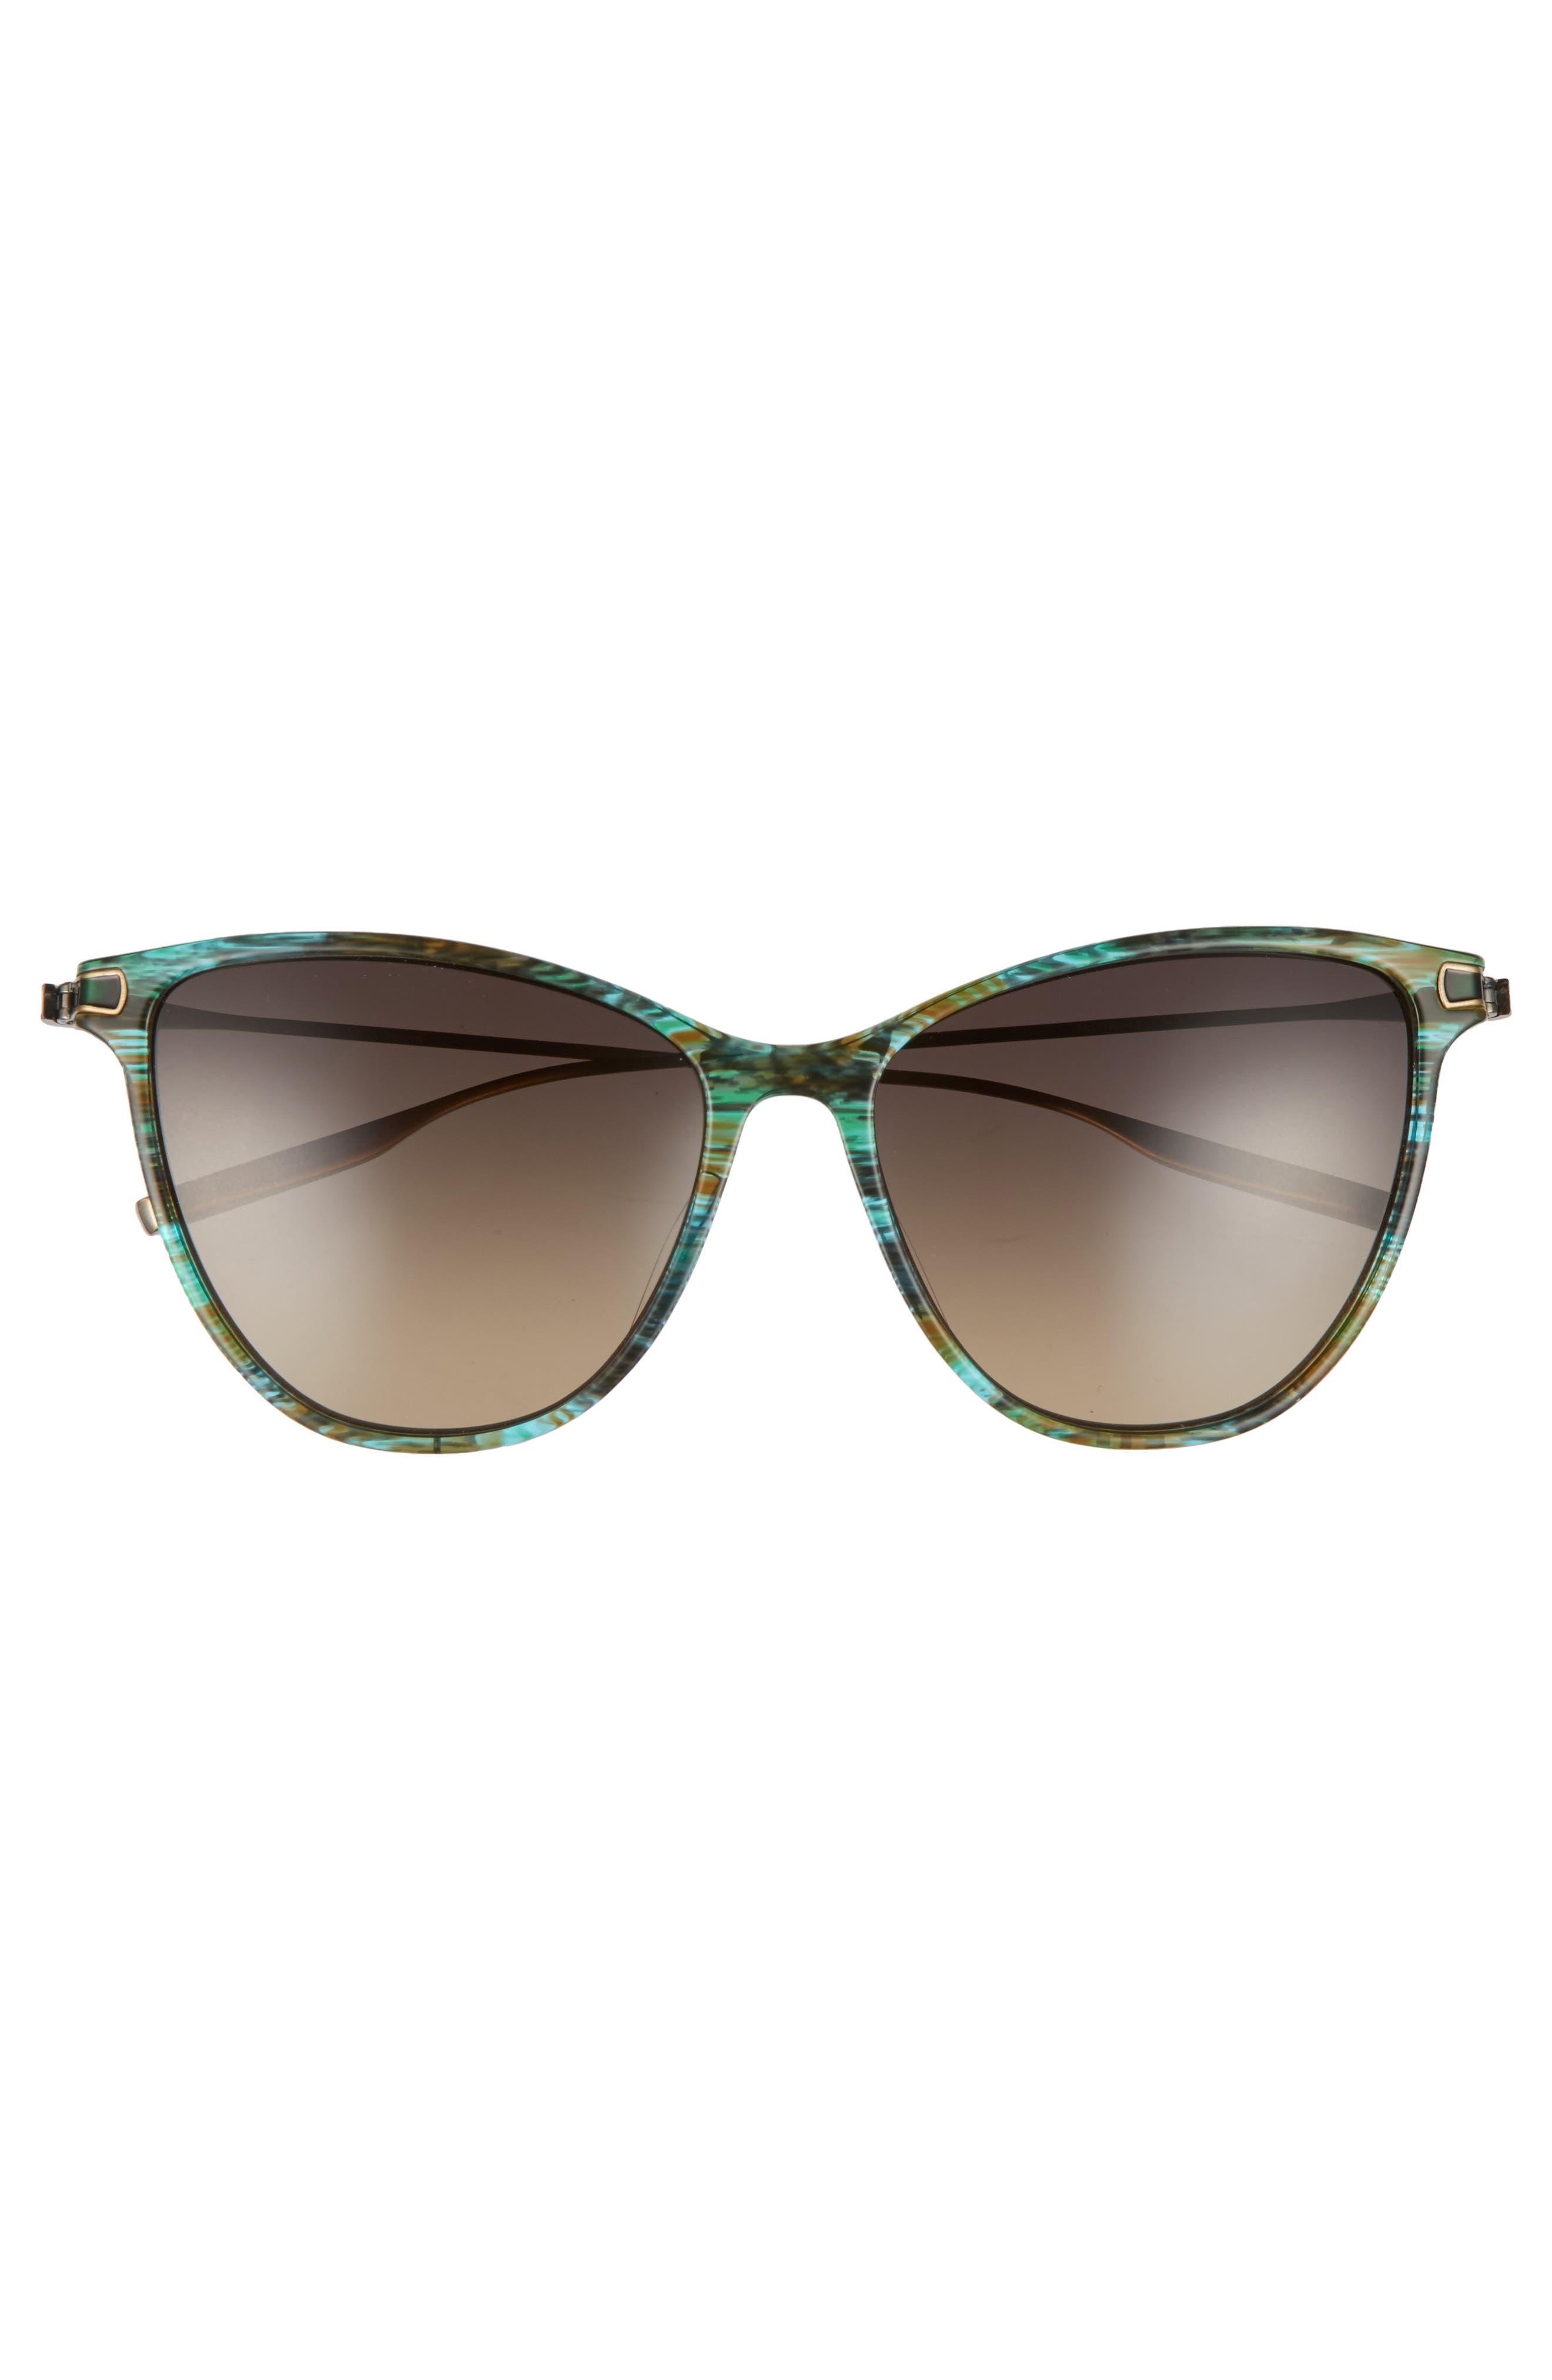 SALT.,                             Nia 58mm Polarized Cat Eye Sunglasses,                             Alternate thumbnail 3, color,                             300